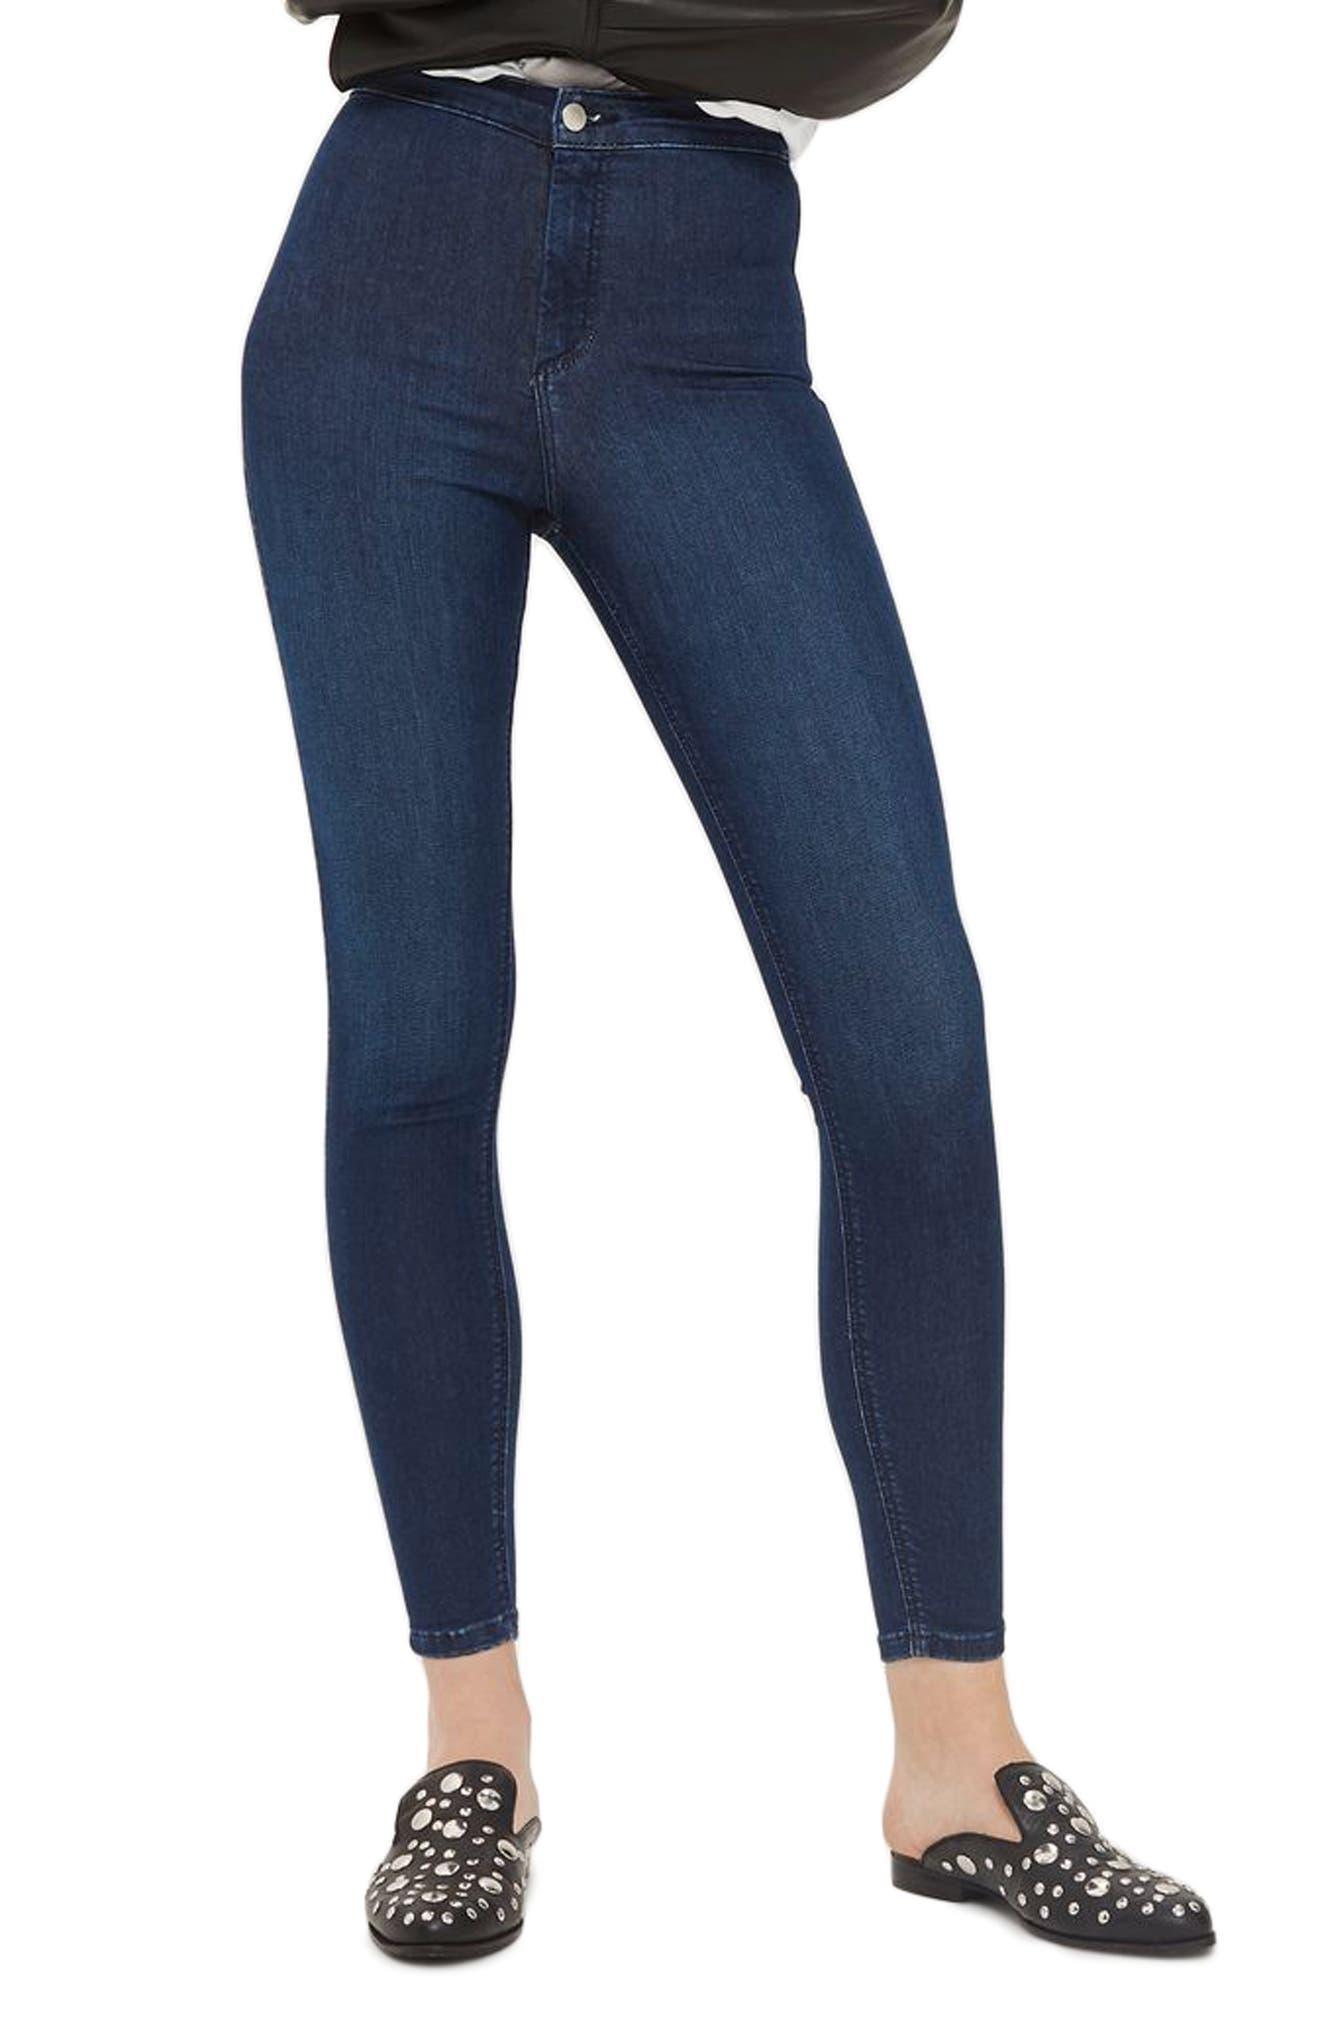 Joni High Waist Ankle Skinny Jeans,                             Main thumbnail 1, color,                             Mid Denim